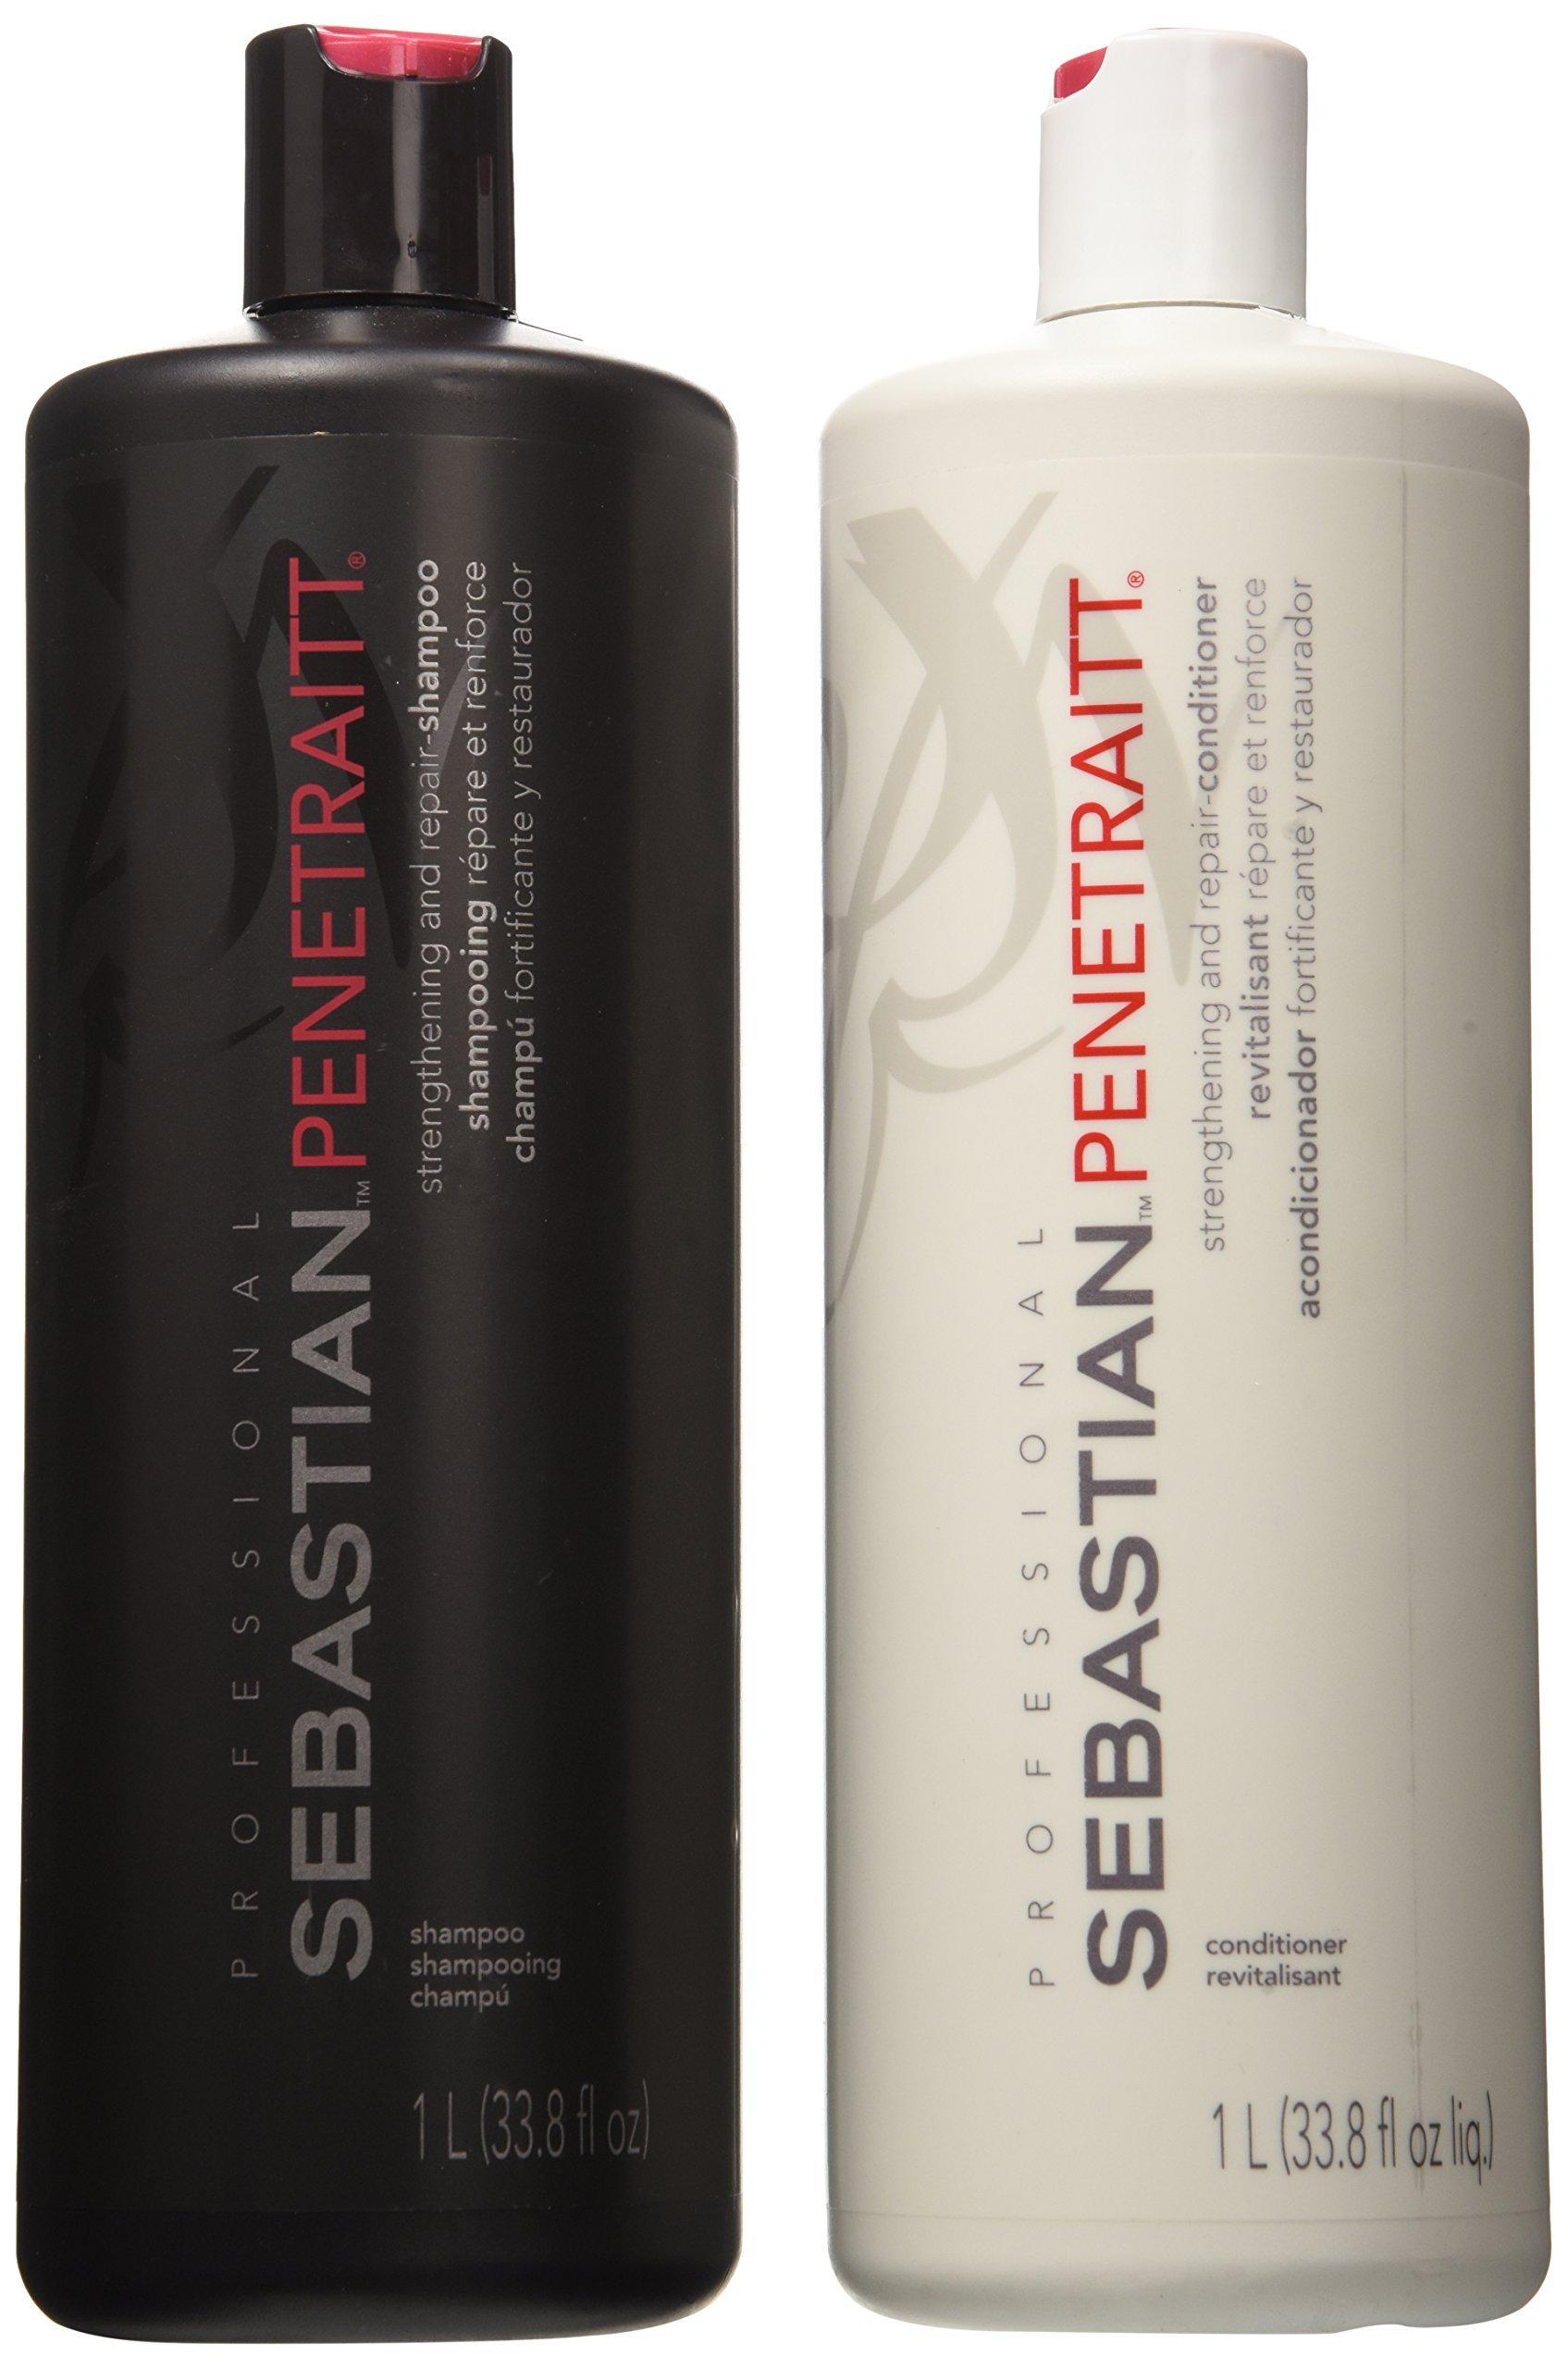 Pokupki customer account login/downloader - Sebastian Penetraitt Strengthening And Repair Shampoo Conditioner Liter Set